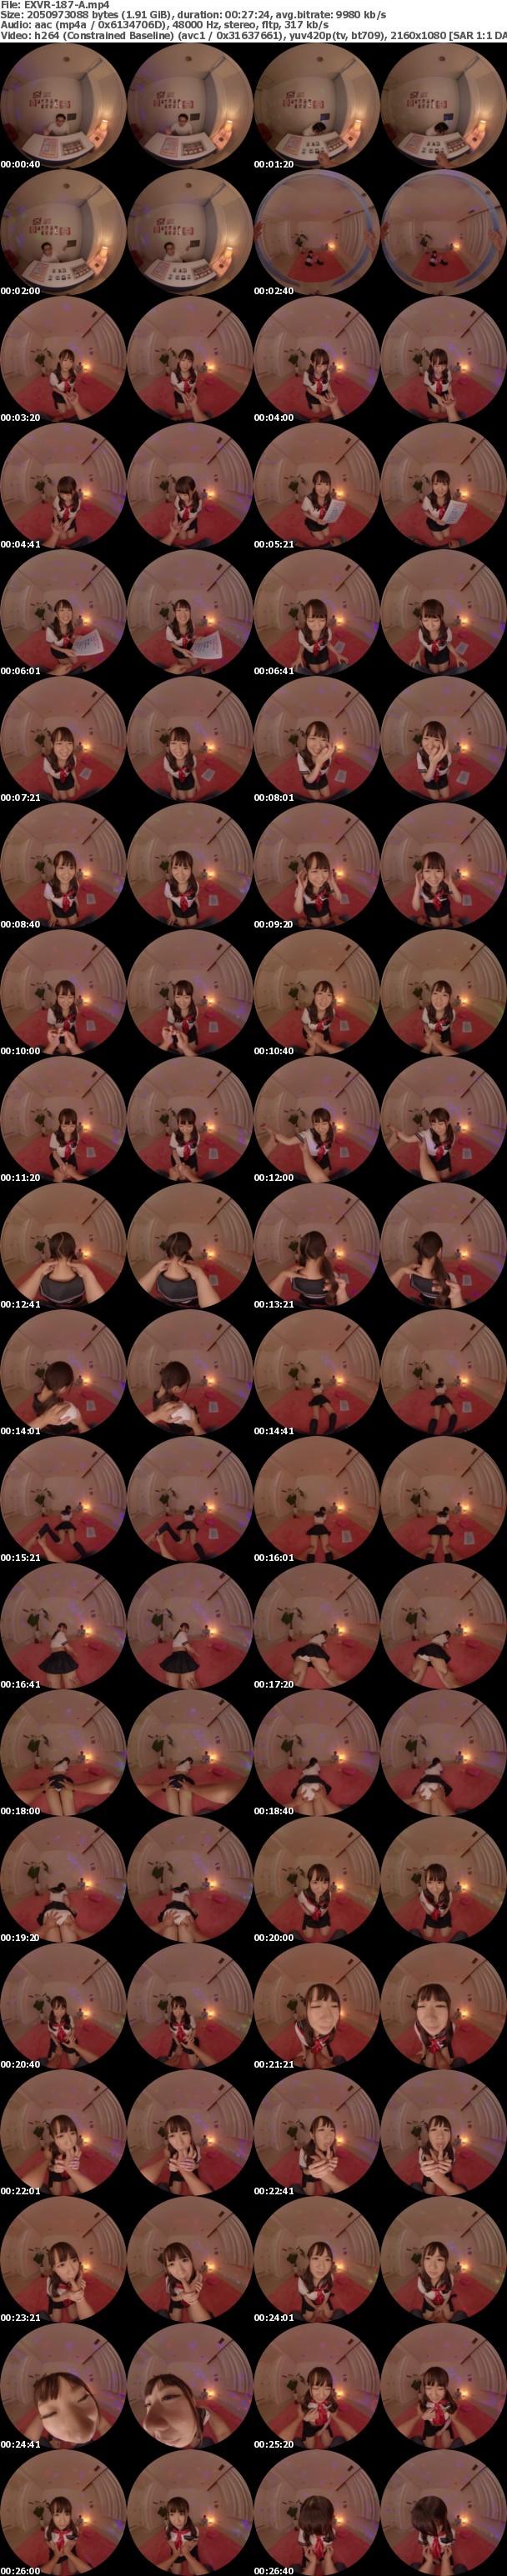 VR/3D EXVR-187 【匠】J●リフレで裏オプ交渉!ひなは本番ダメだけどスマタまでの約束がいつの間にか先っぽ入れられて 結局これって本番じゃん 茉莉ひな